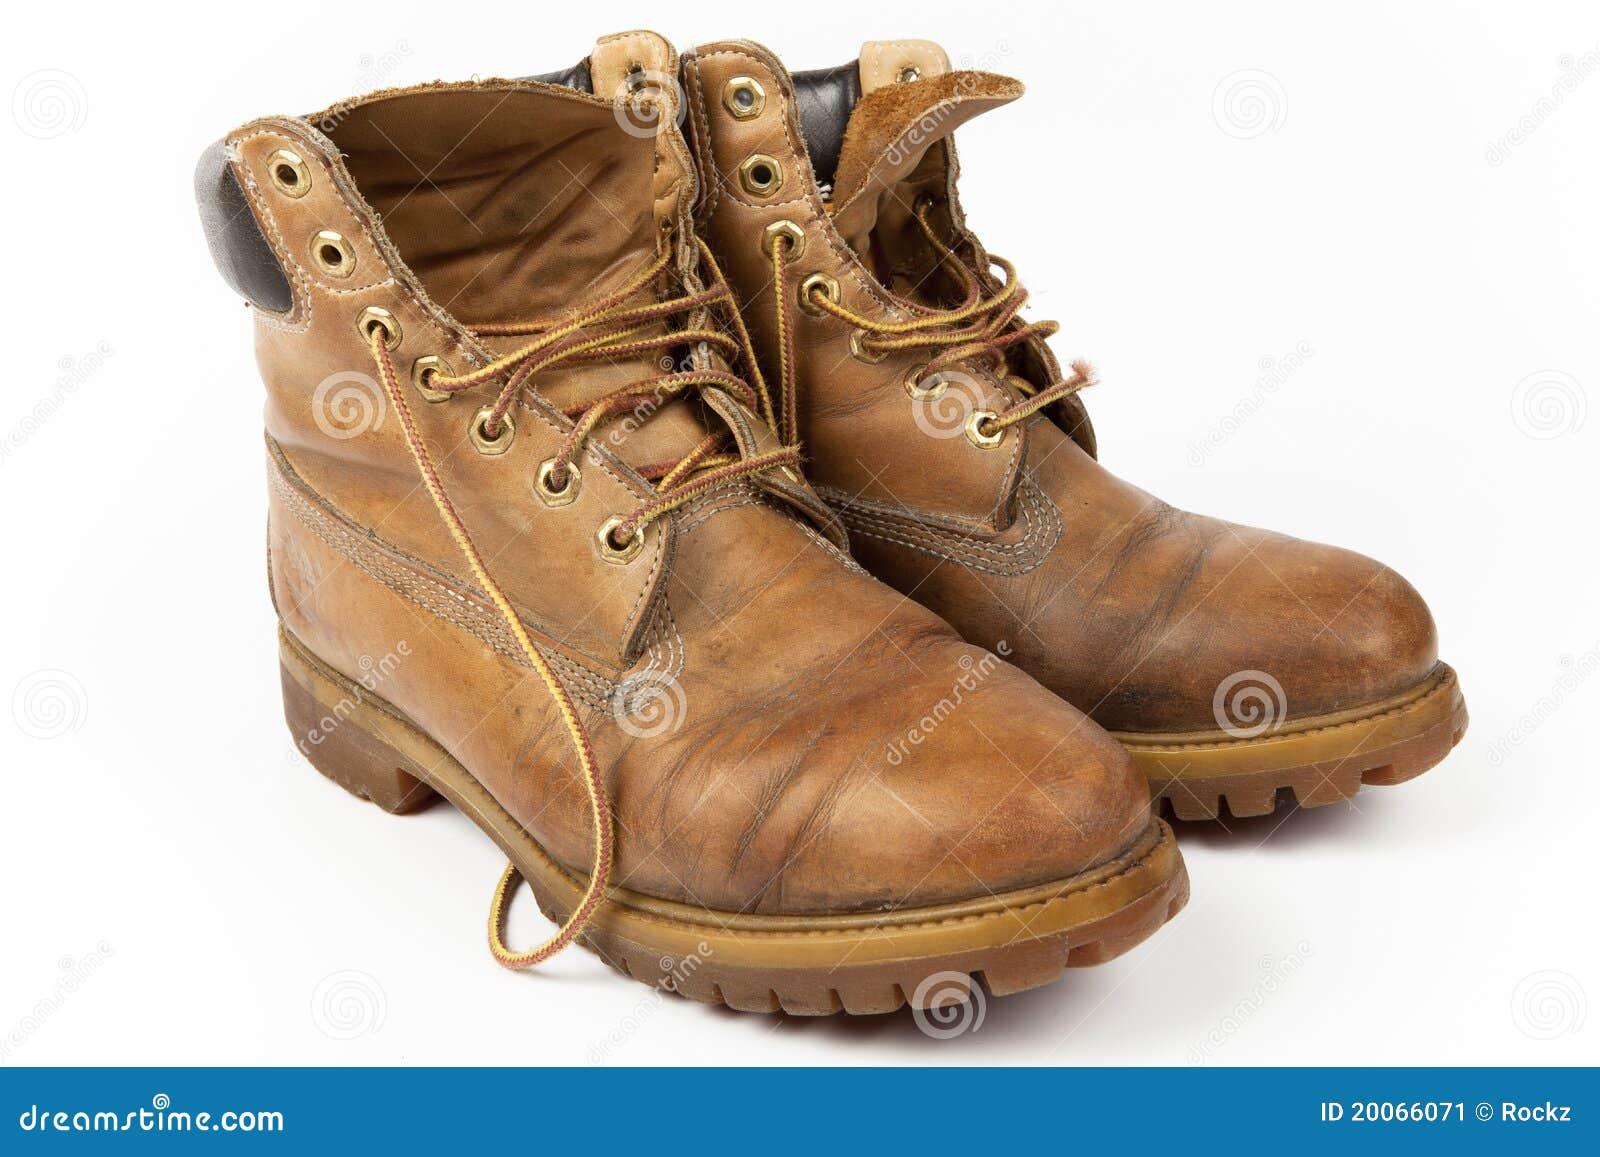 pair of old shoes stock image image 20066071. Black Bedroom Furniture Sets. Home Design Ideas